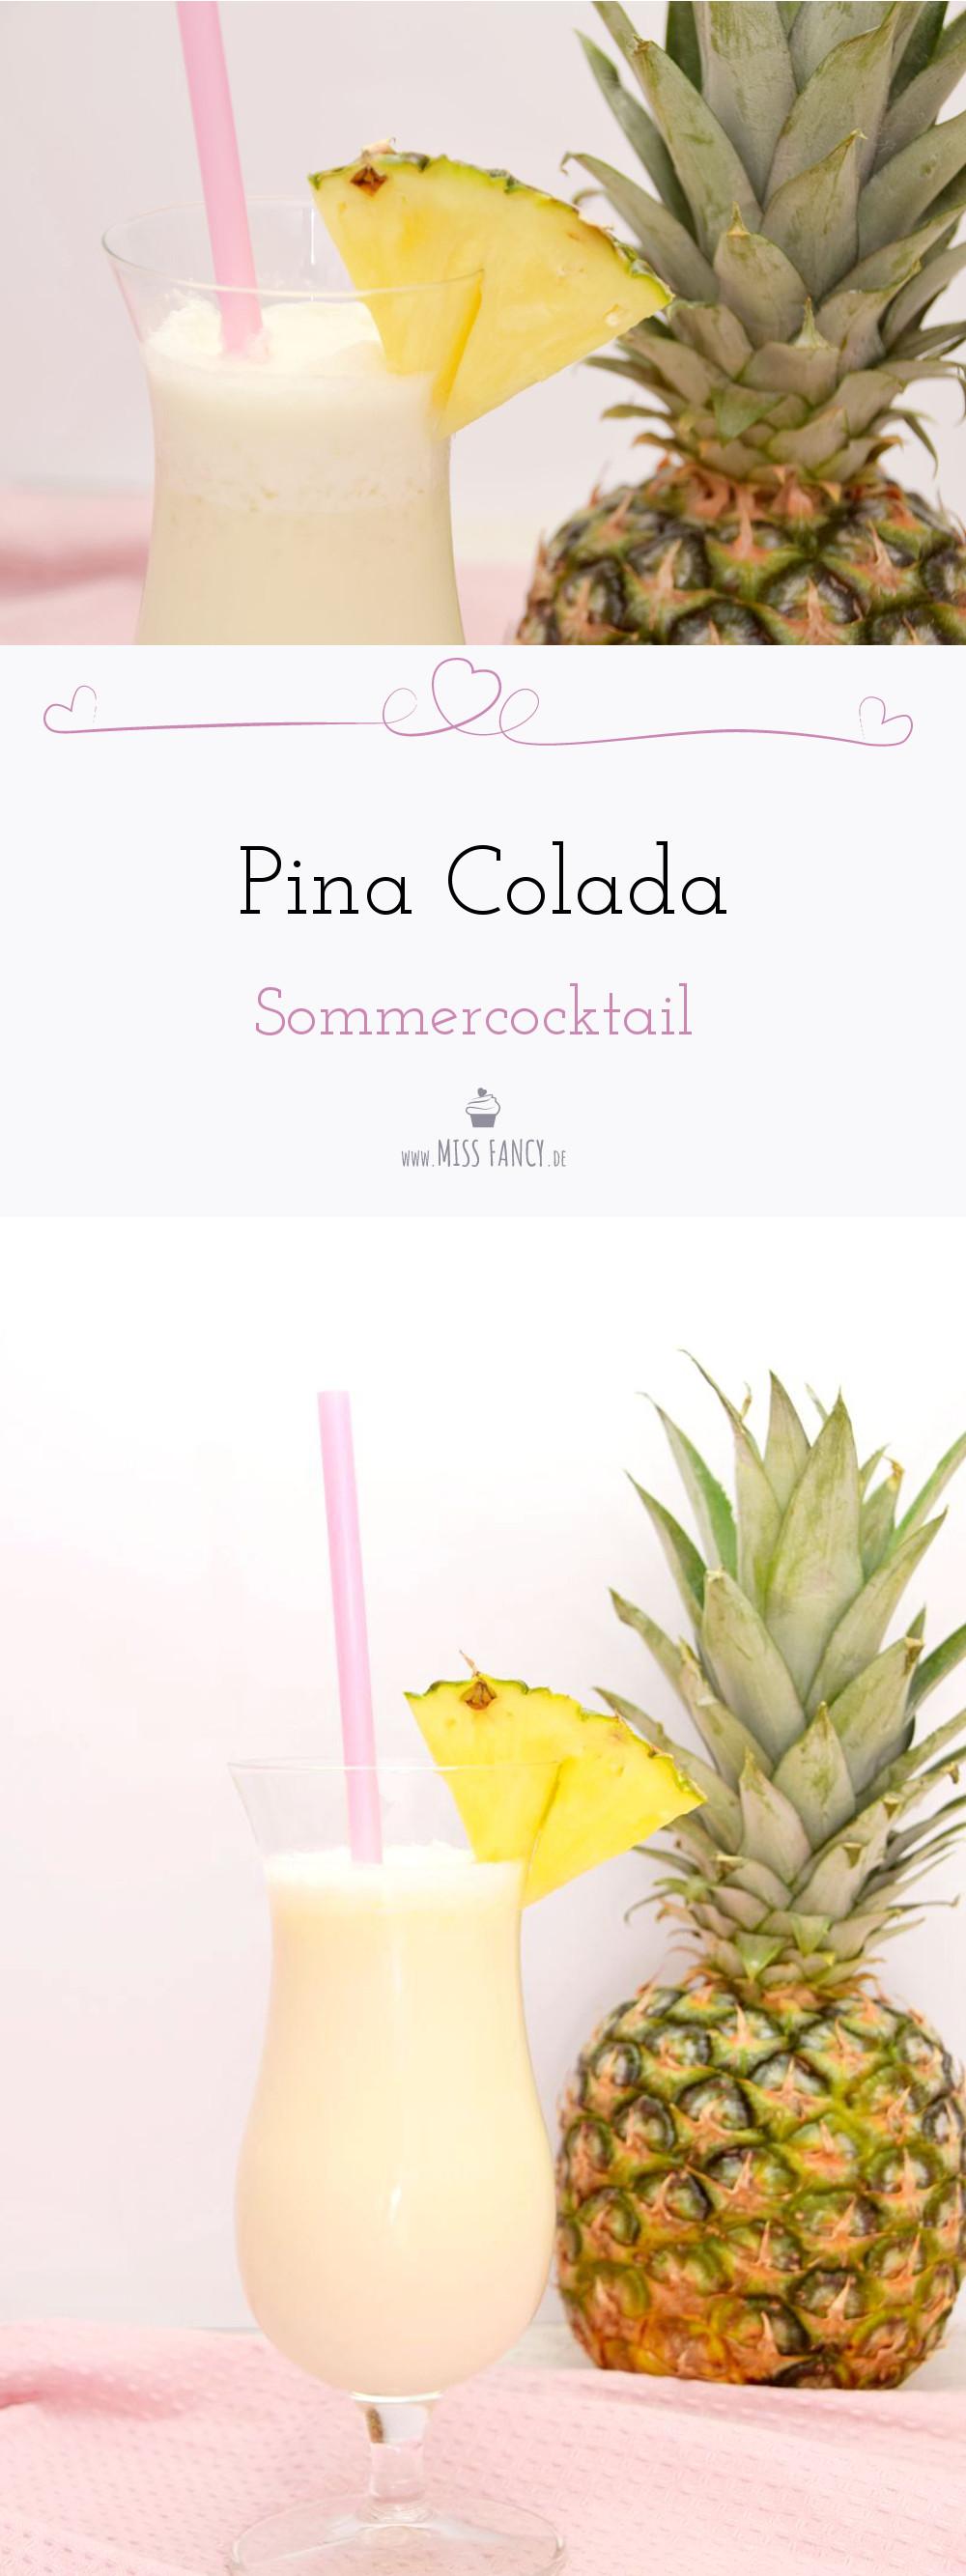 Pina-Colada-Sommercocktail-missfancy.de